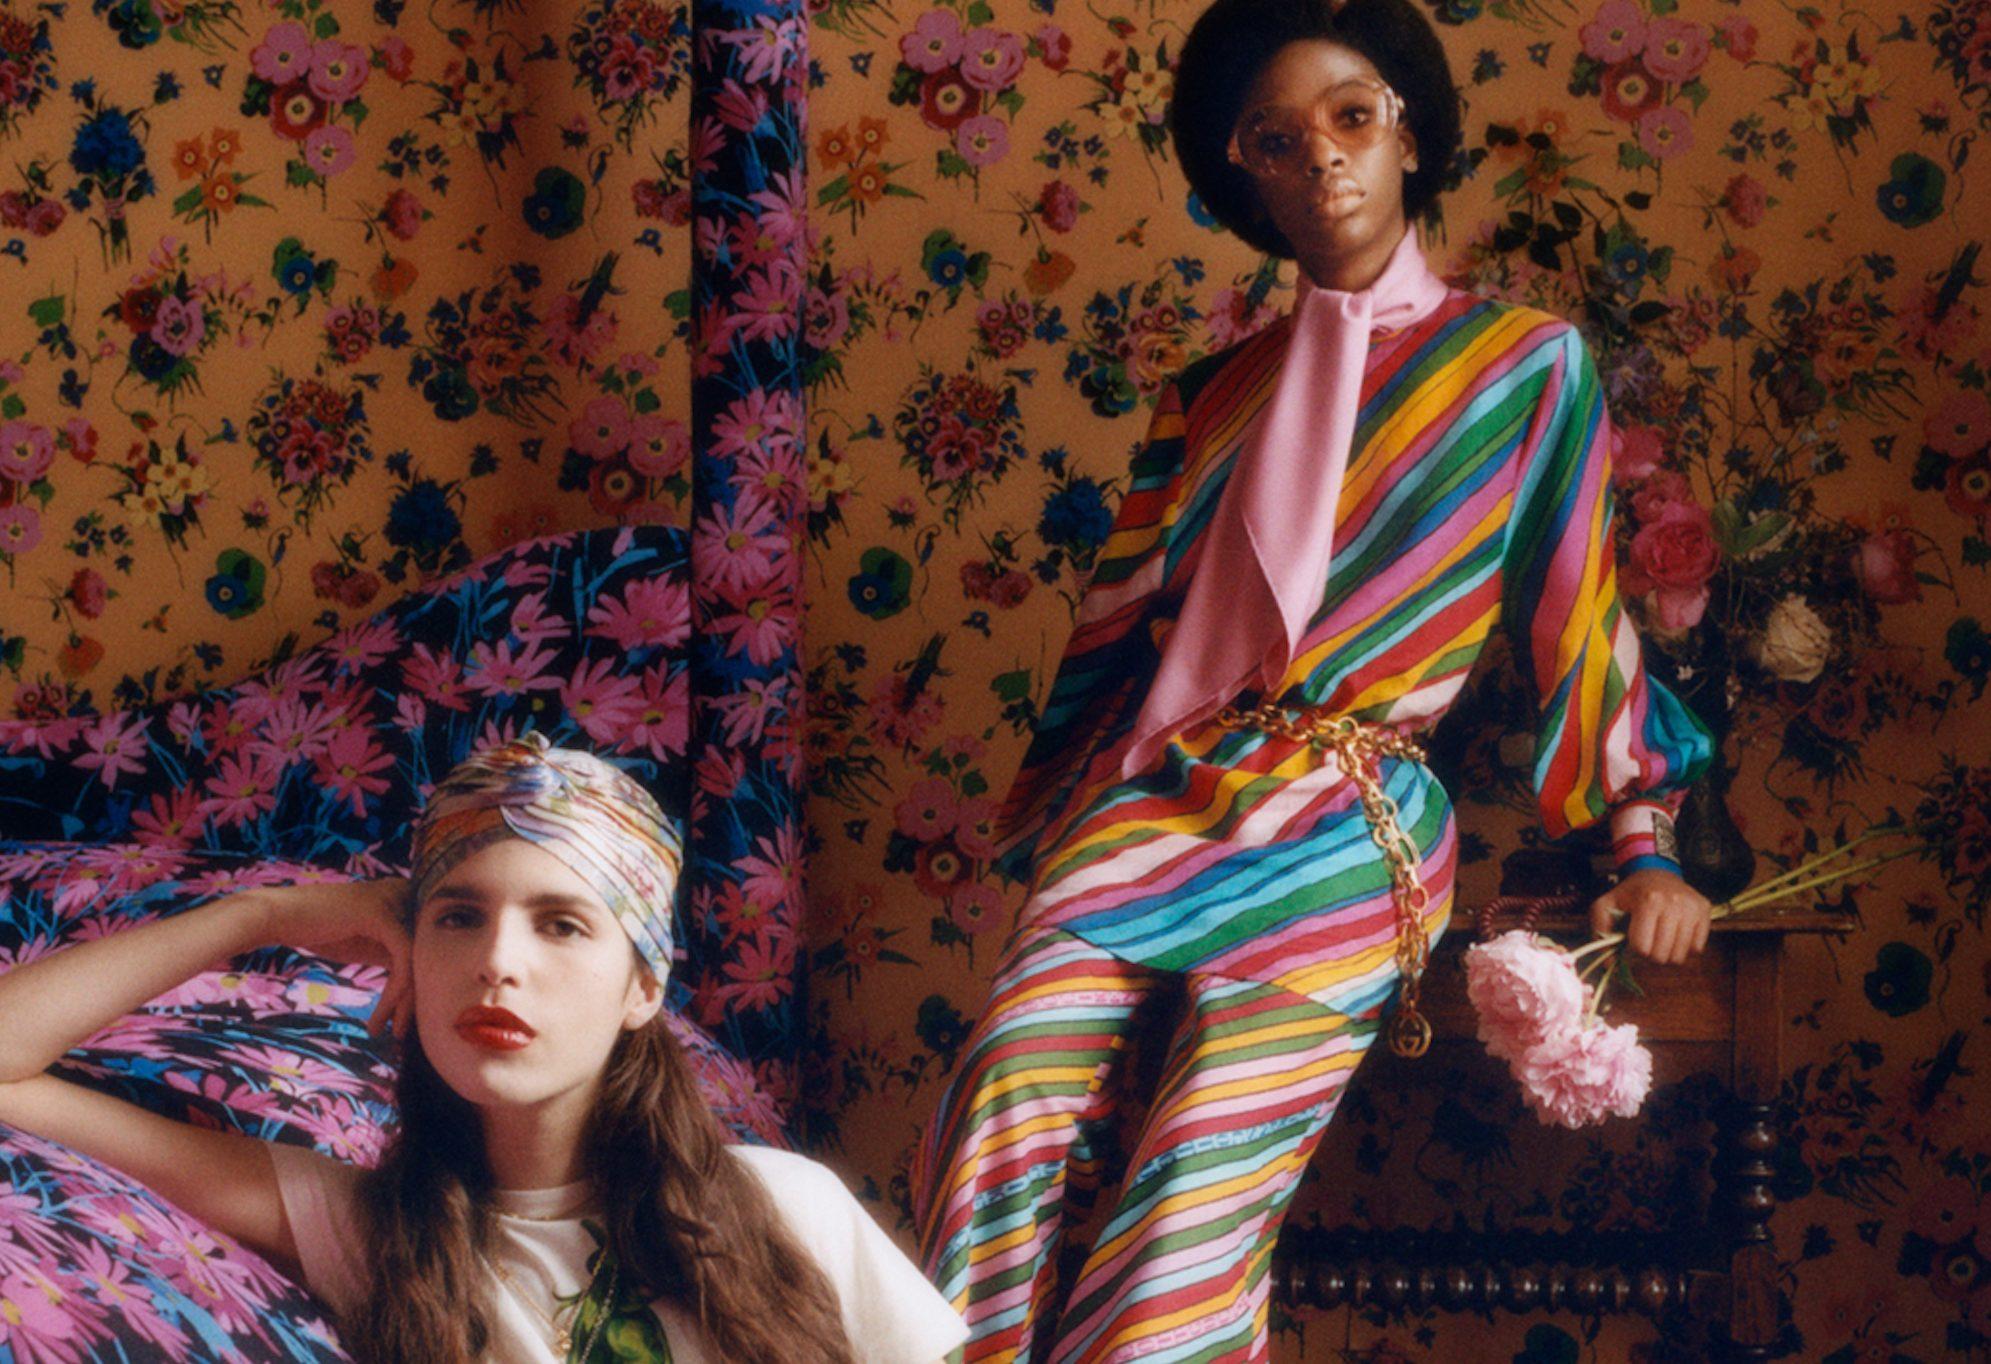 Gucci Ken Scott Collection Gucci Ken Scott Collection Vanity Teen 虚荣青年 Menswear & new faces magazine